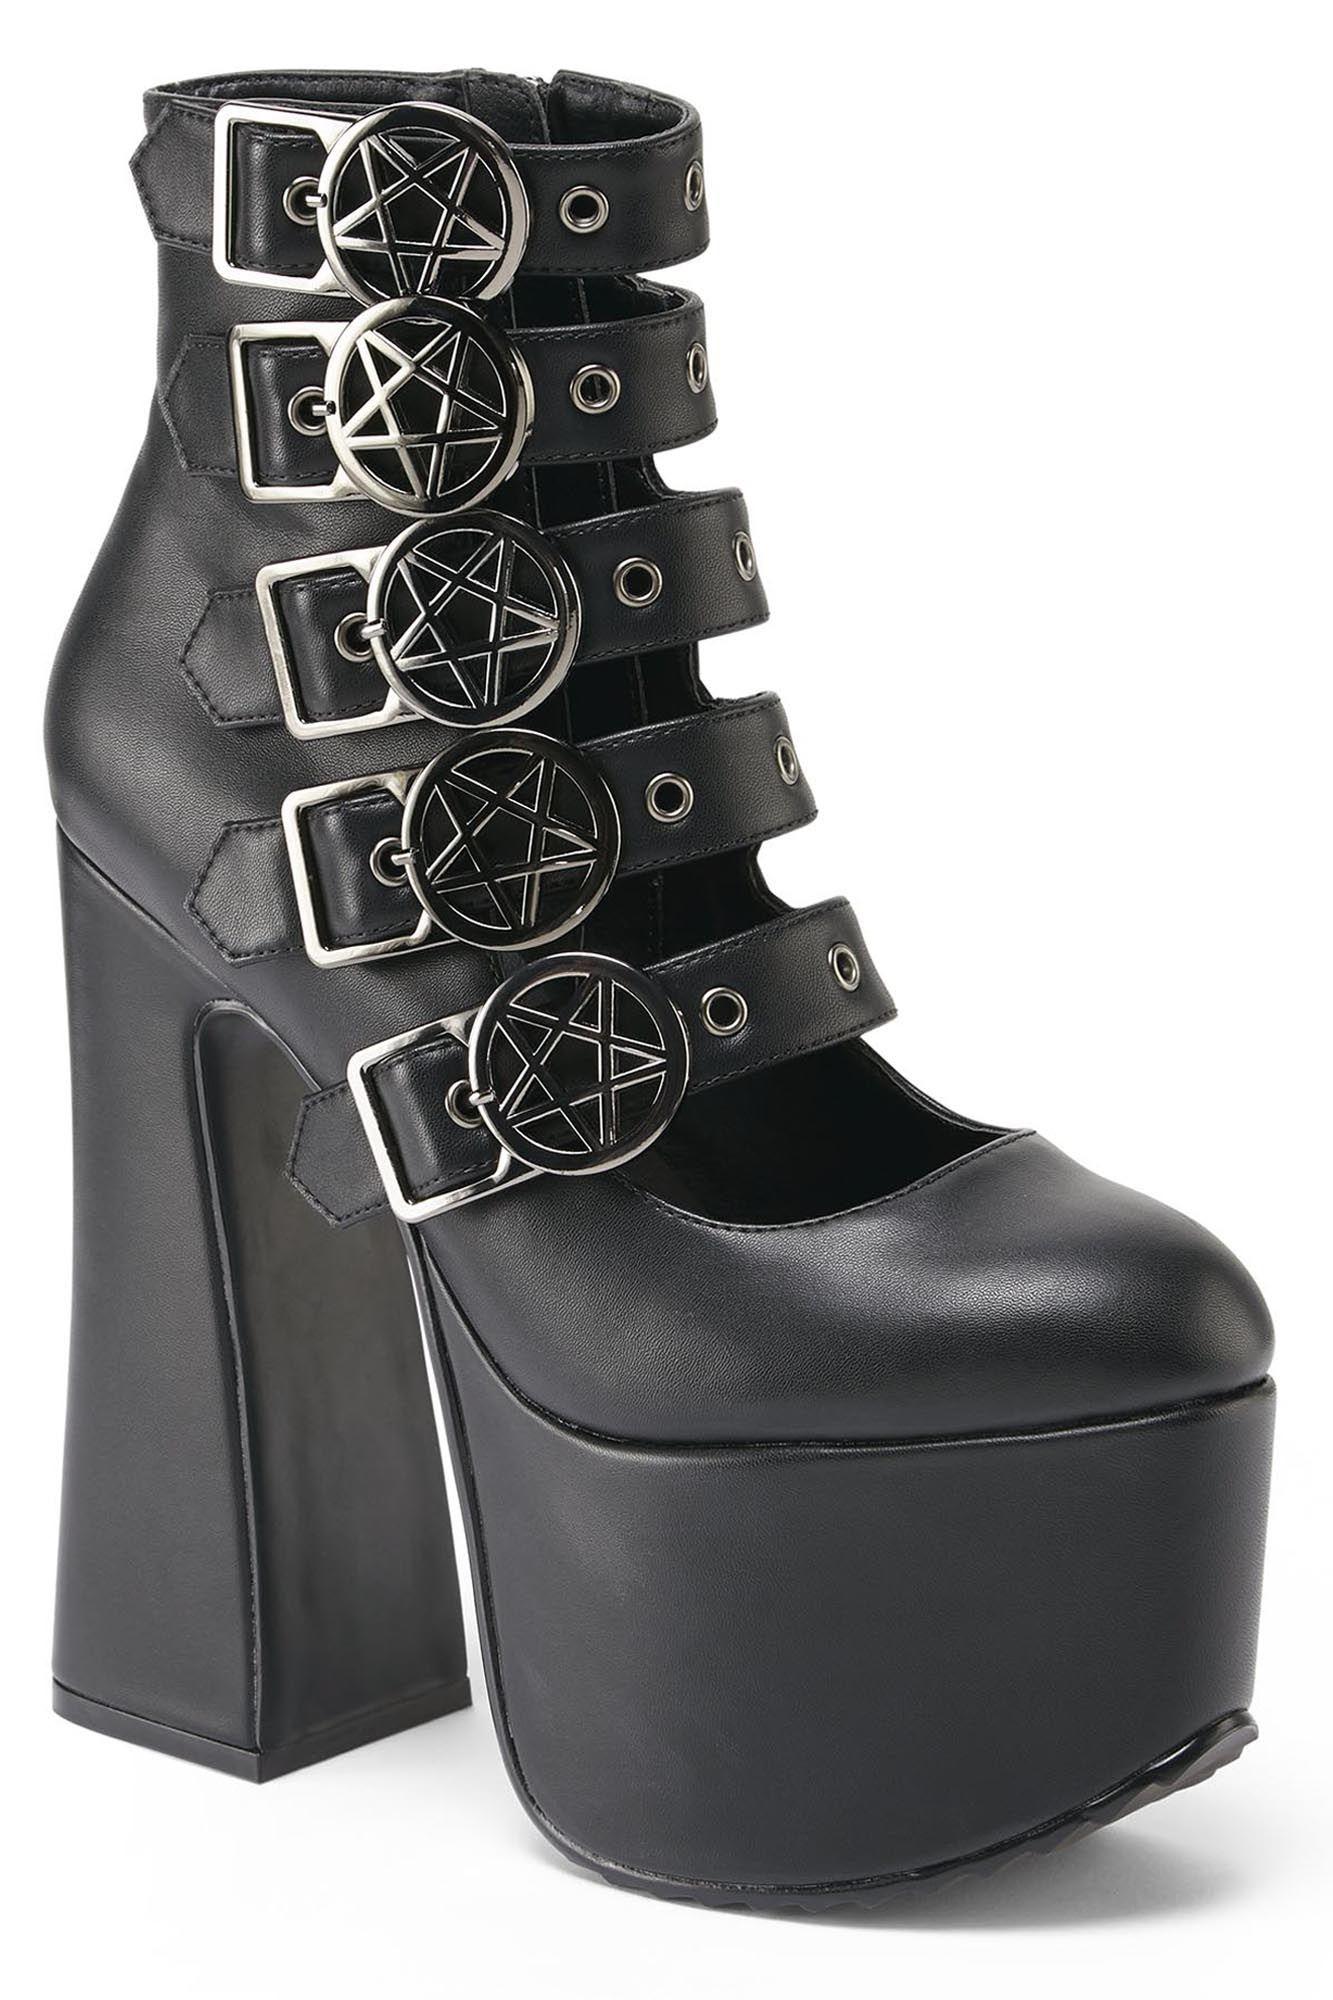 ks2306_chaussures-bottes-plateforme-gothique-glam-rock-burial-pentagramme